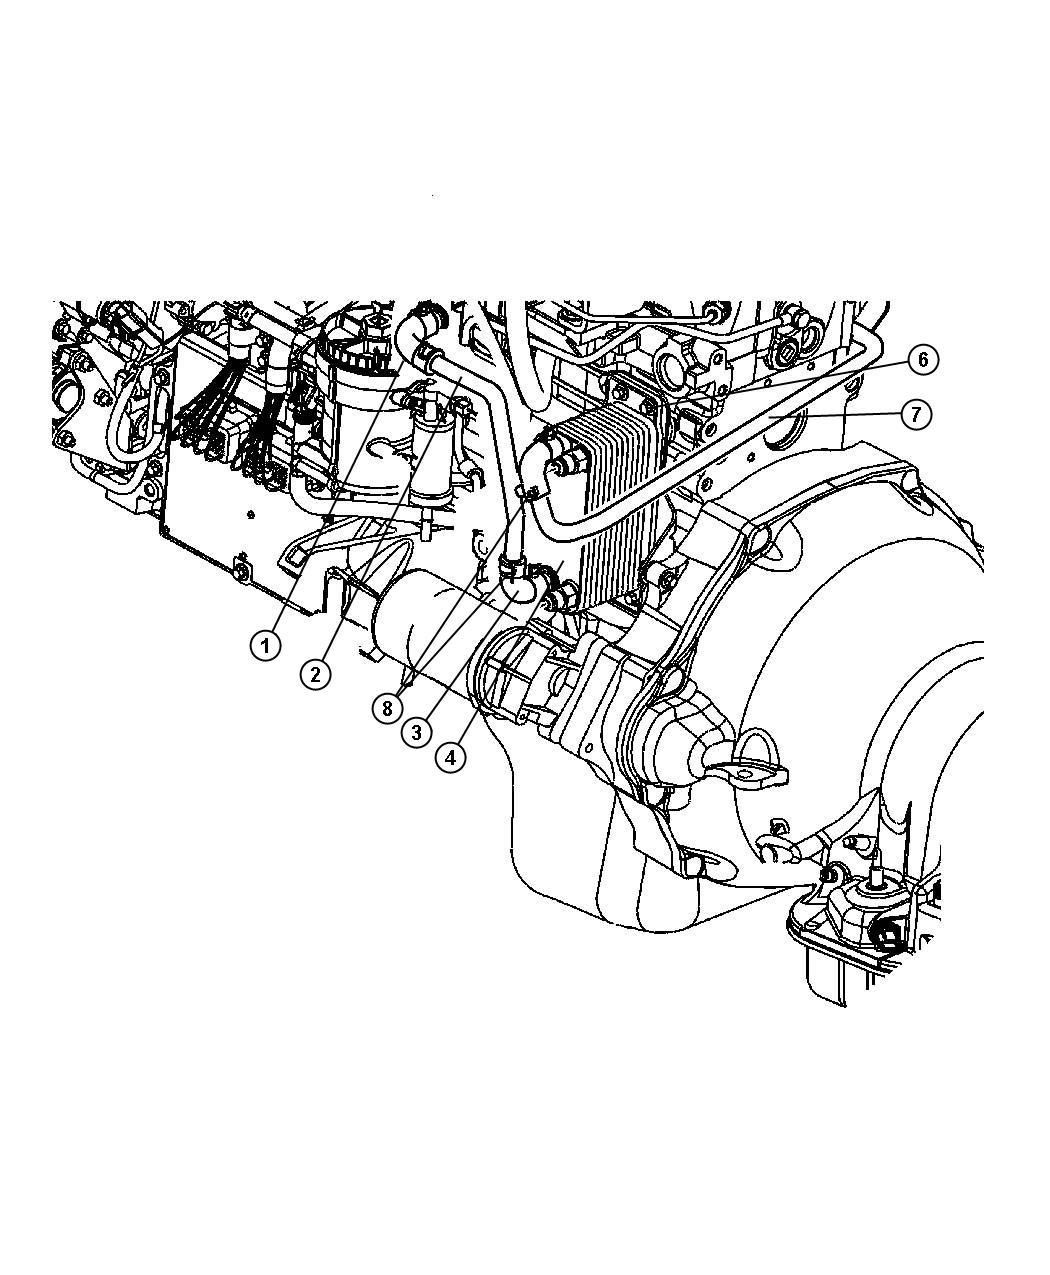 service manual  2005 cadillac xlr leaking transmission